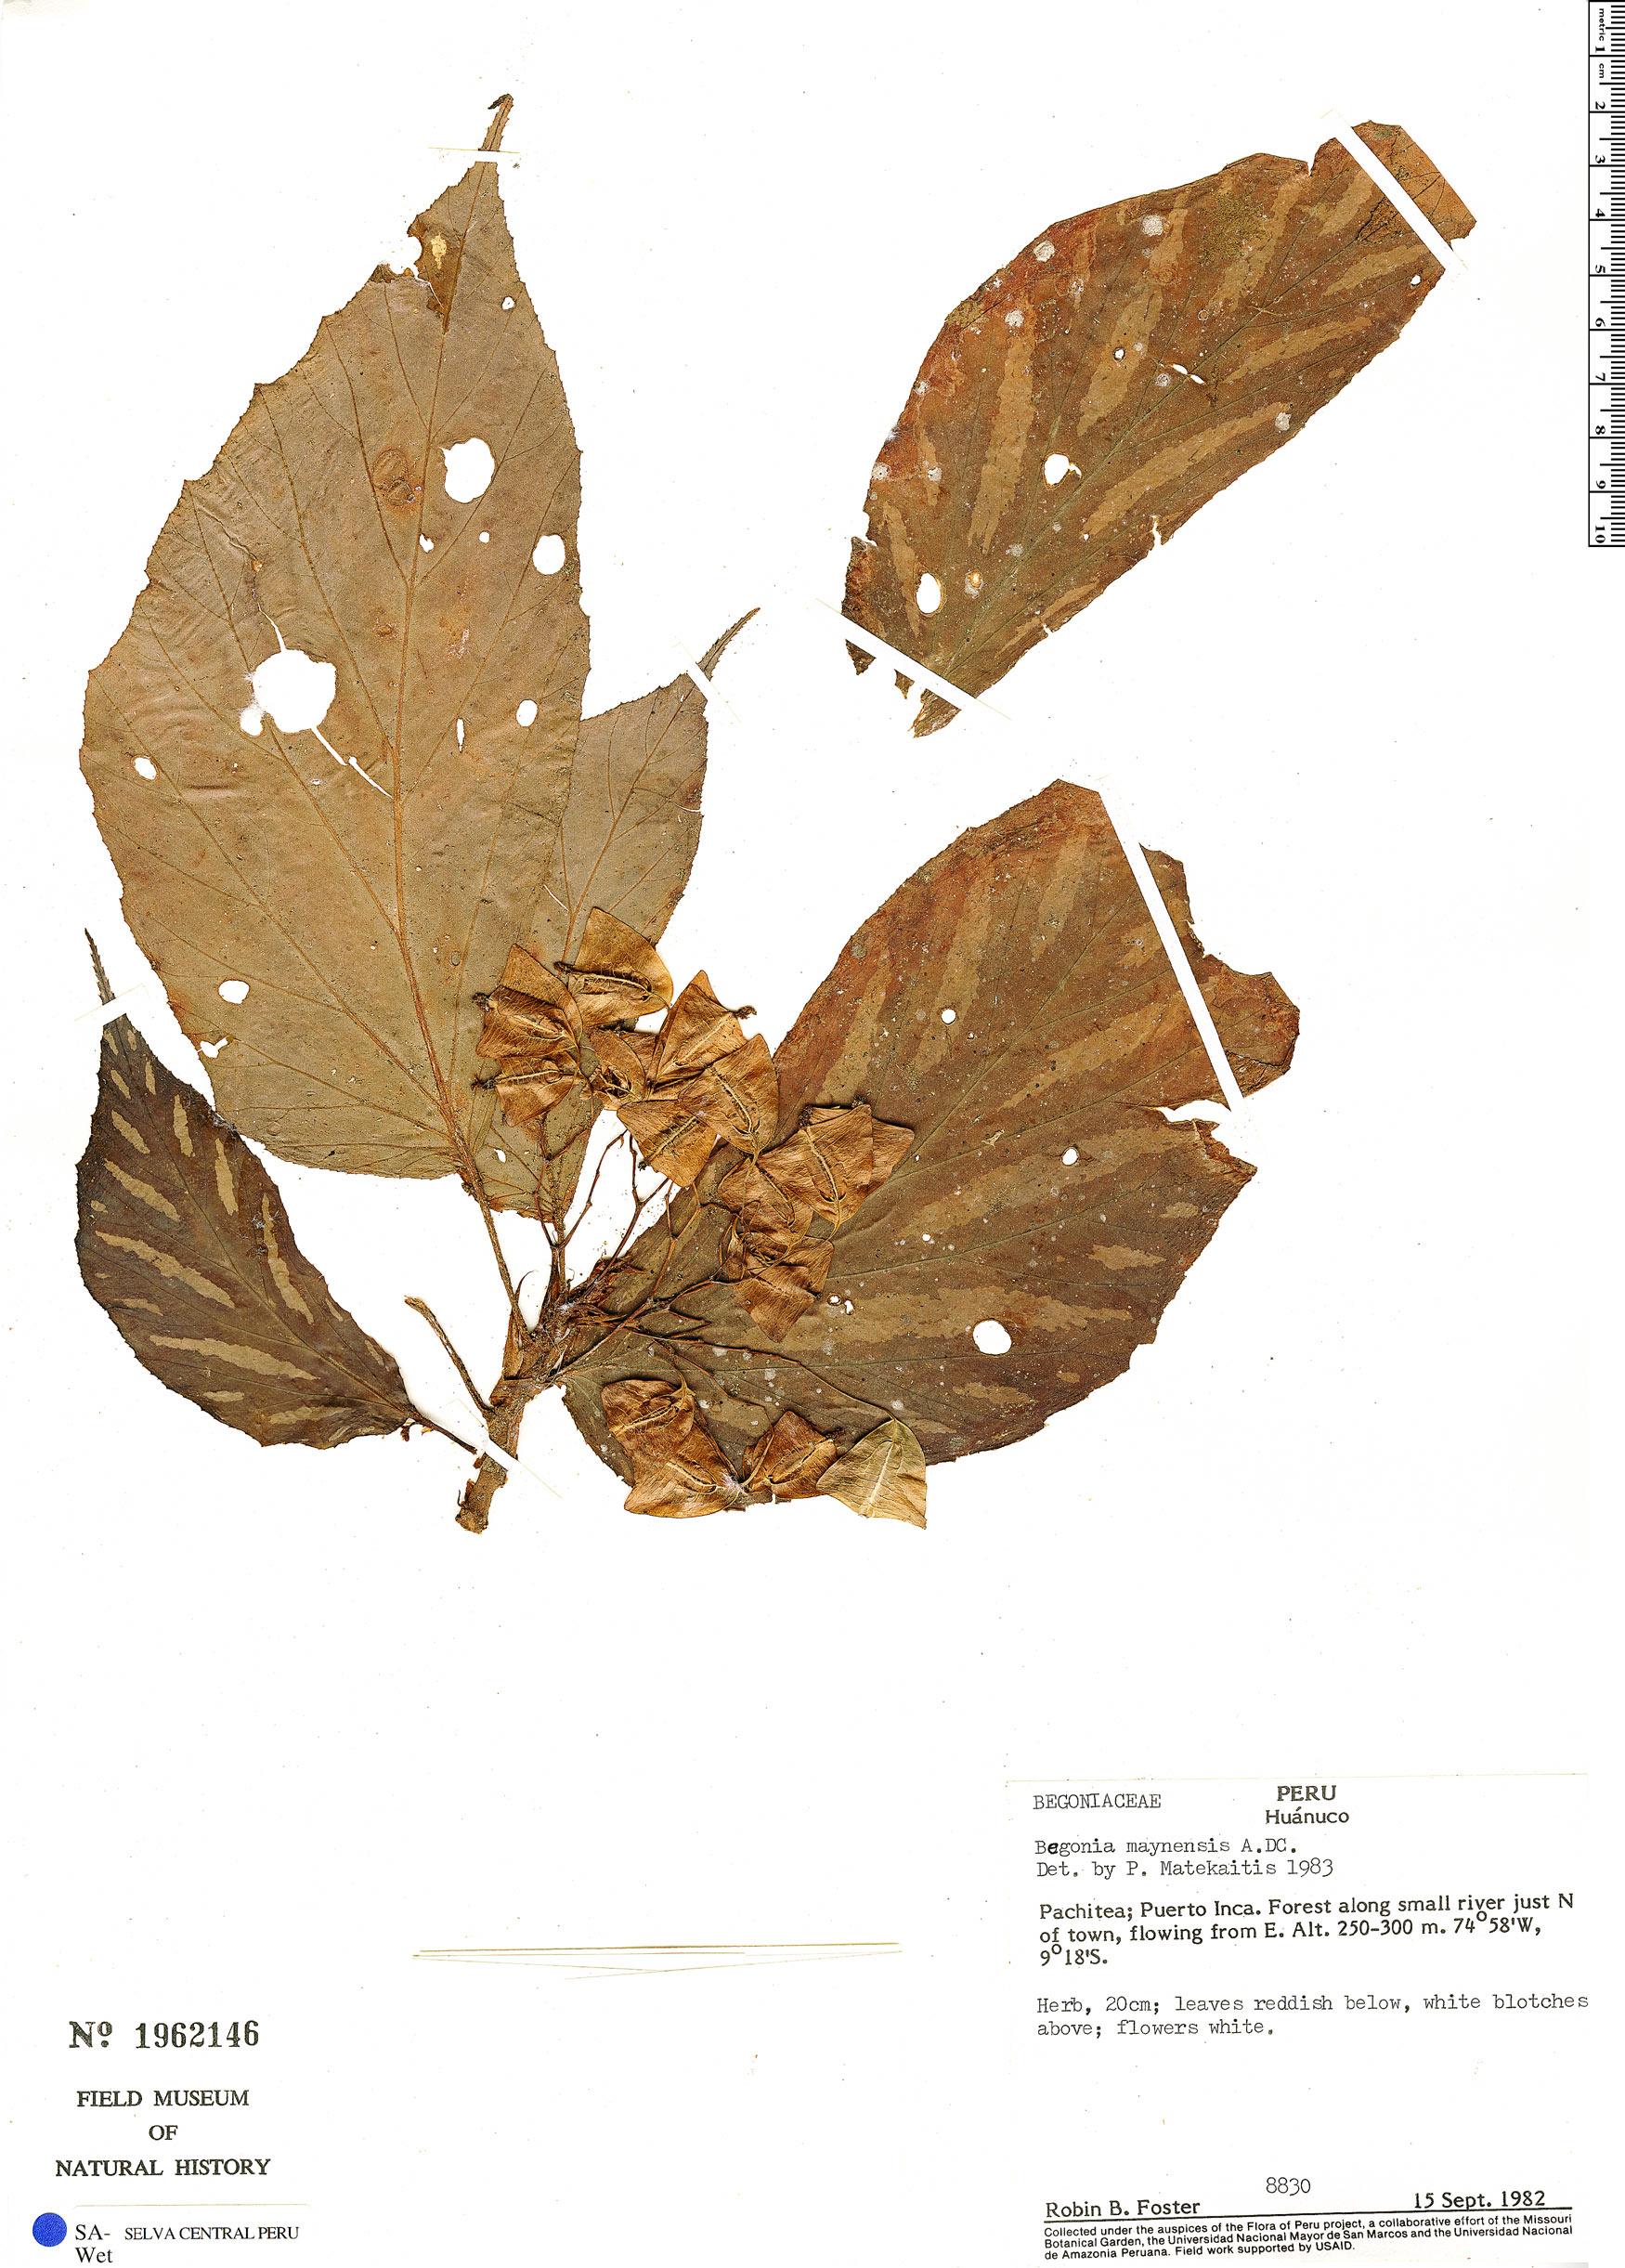 Espécimen: Begonia maynensis